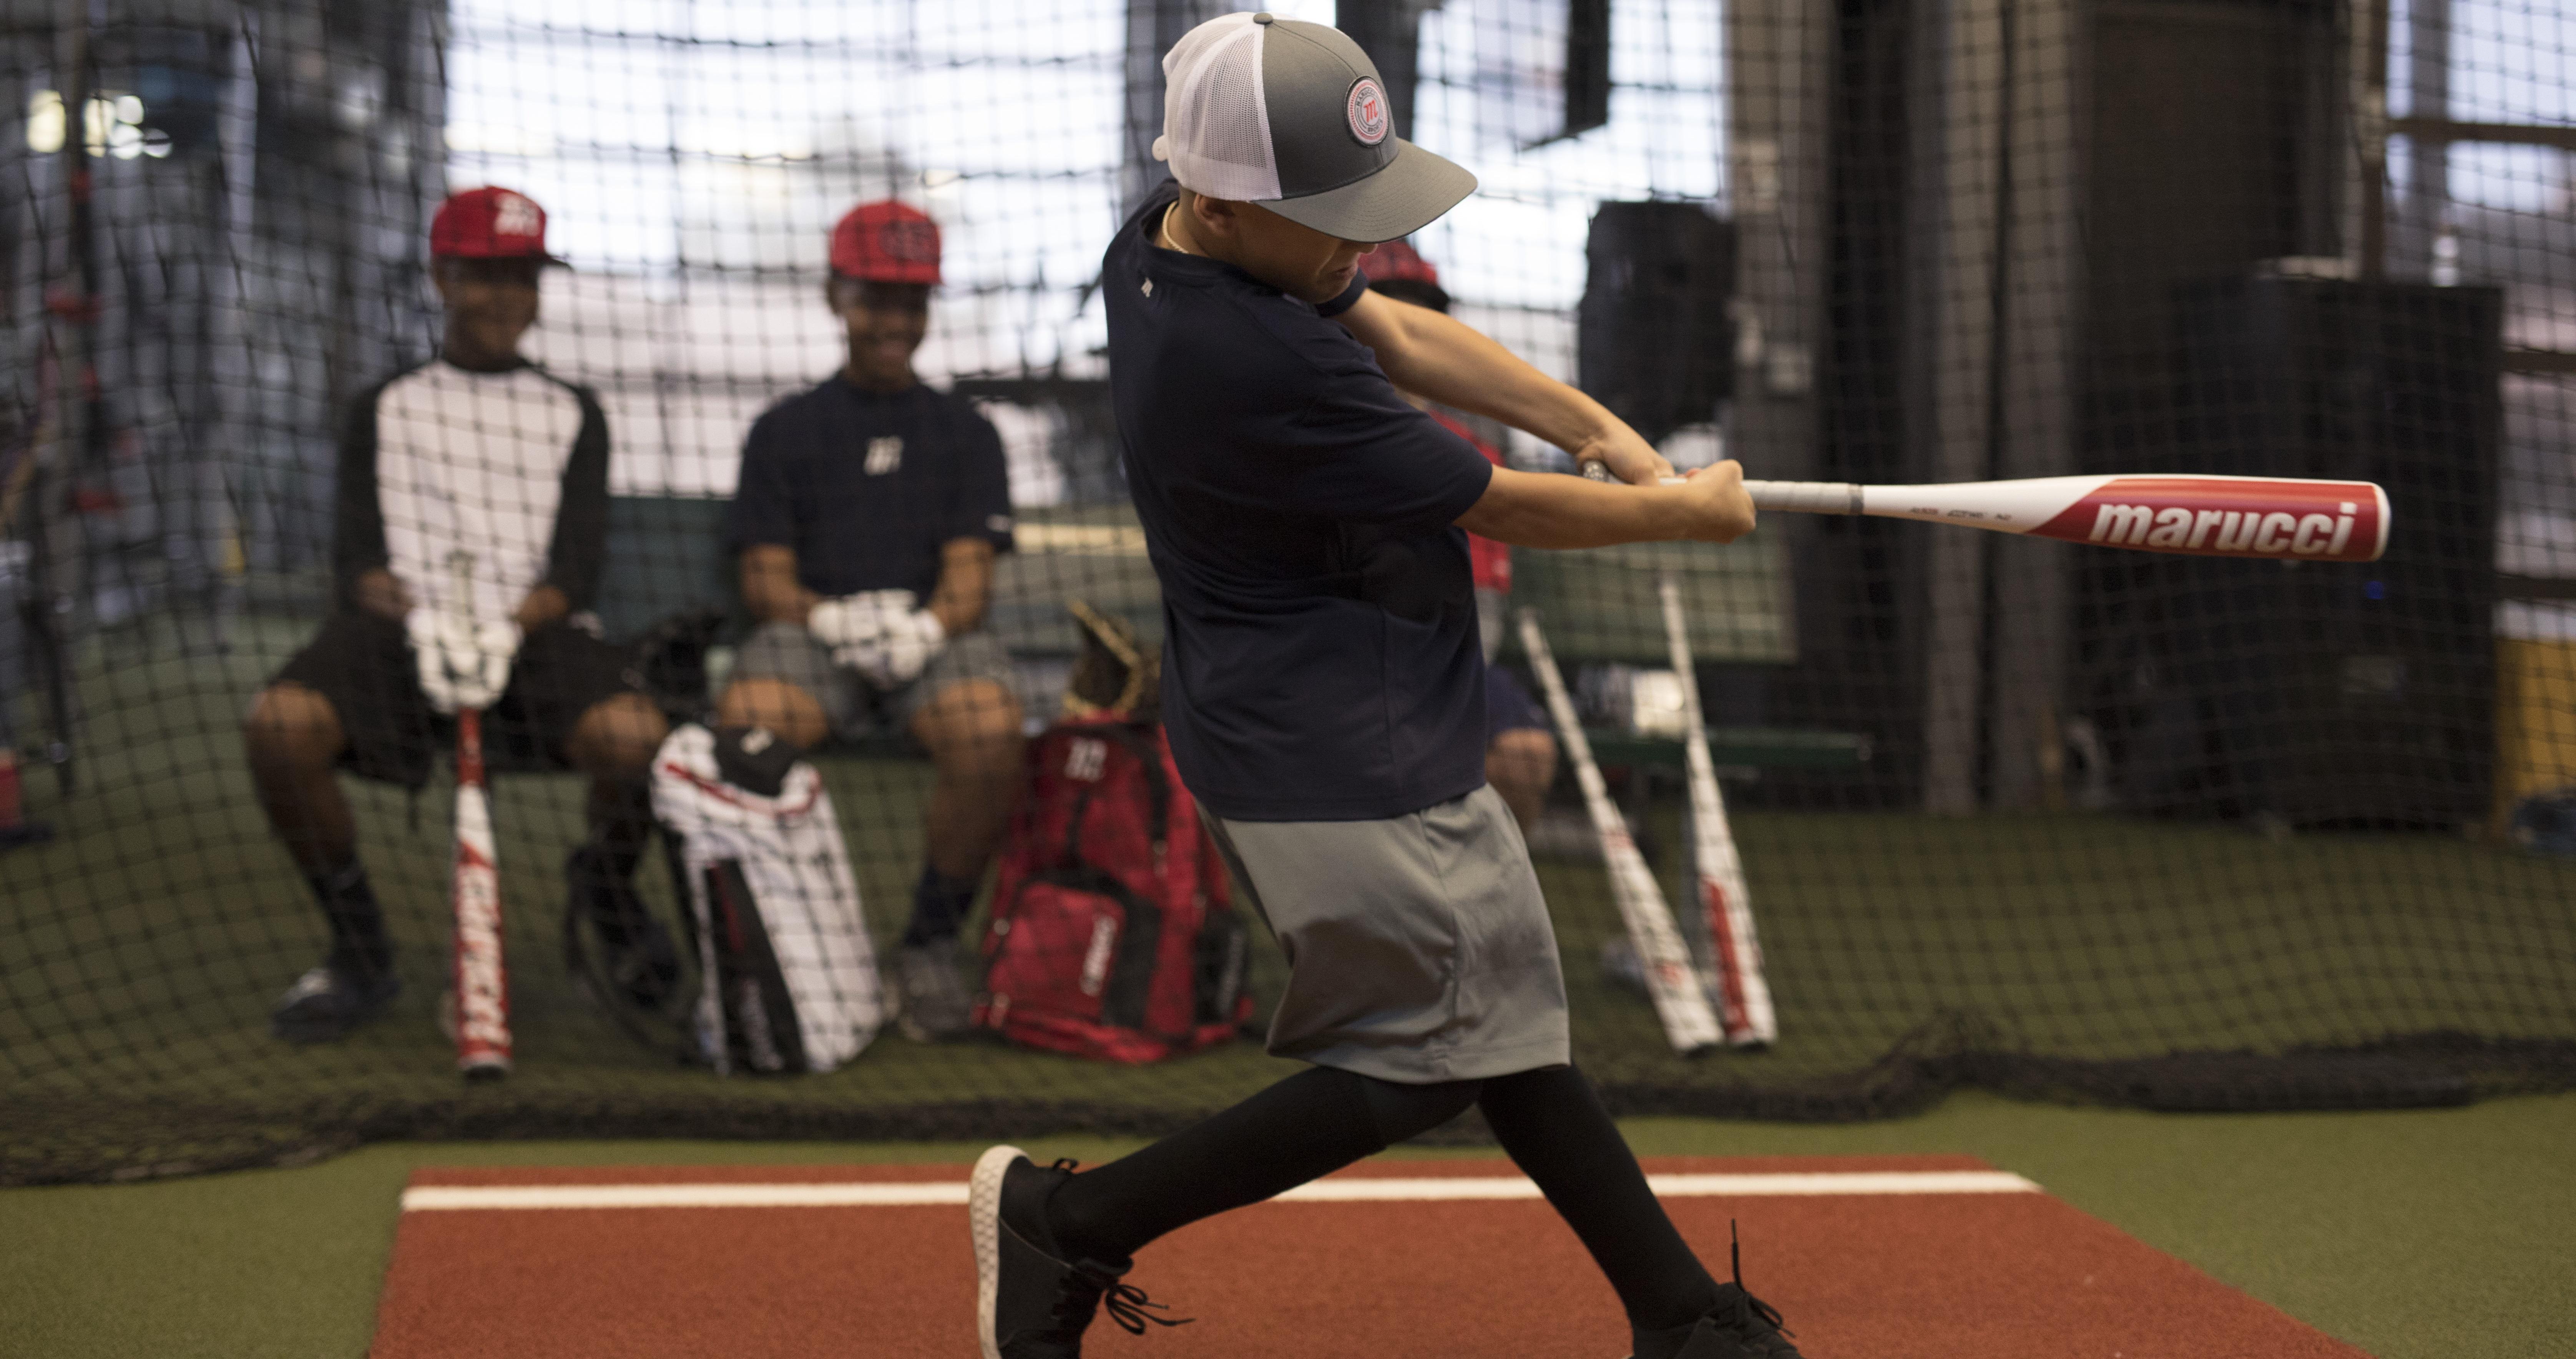 Marucci CAT 8 baseball bat lineup